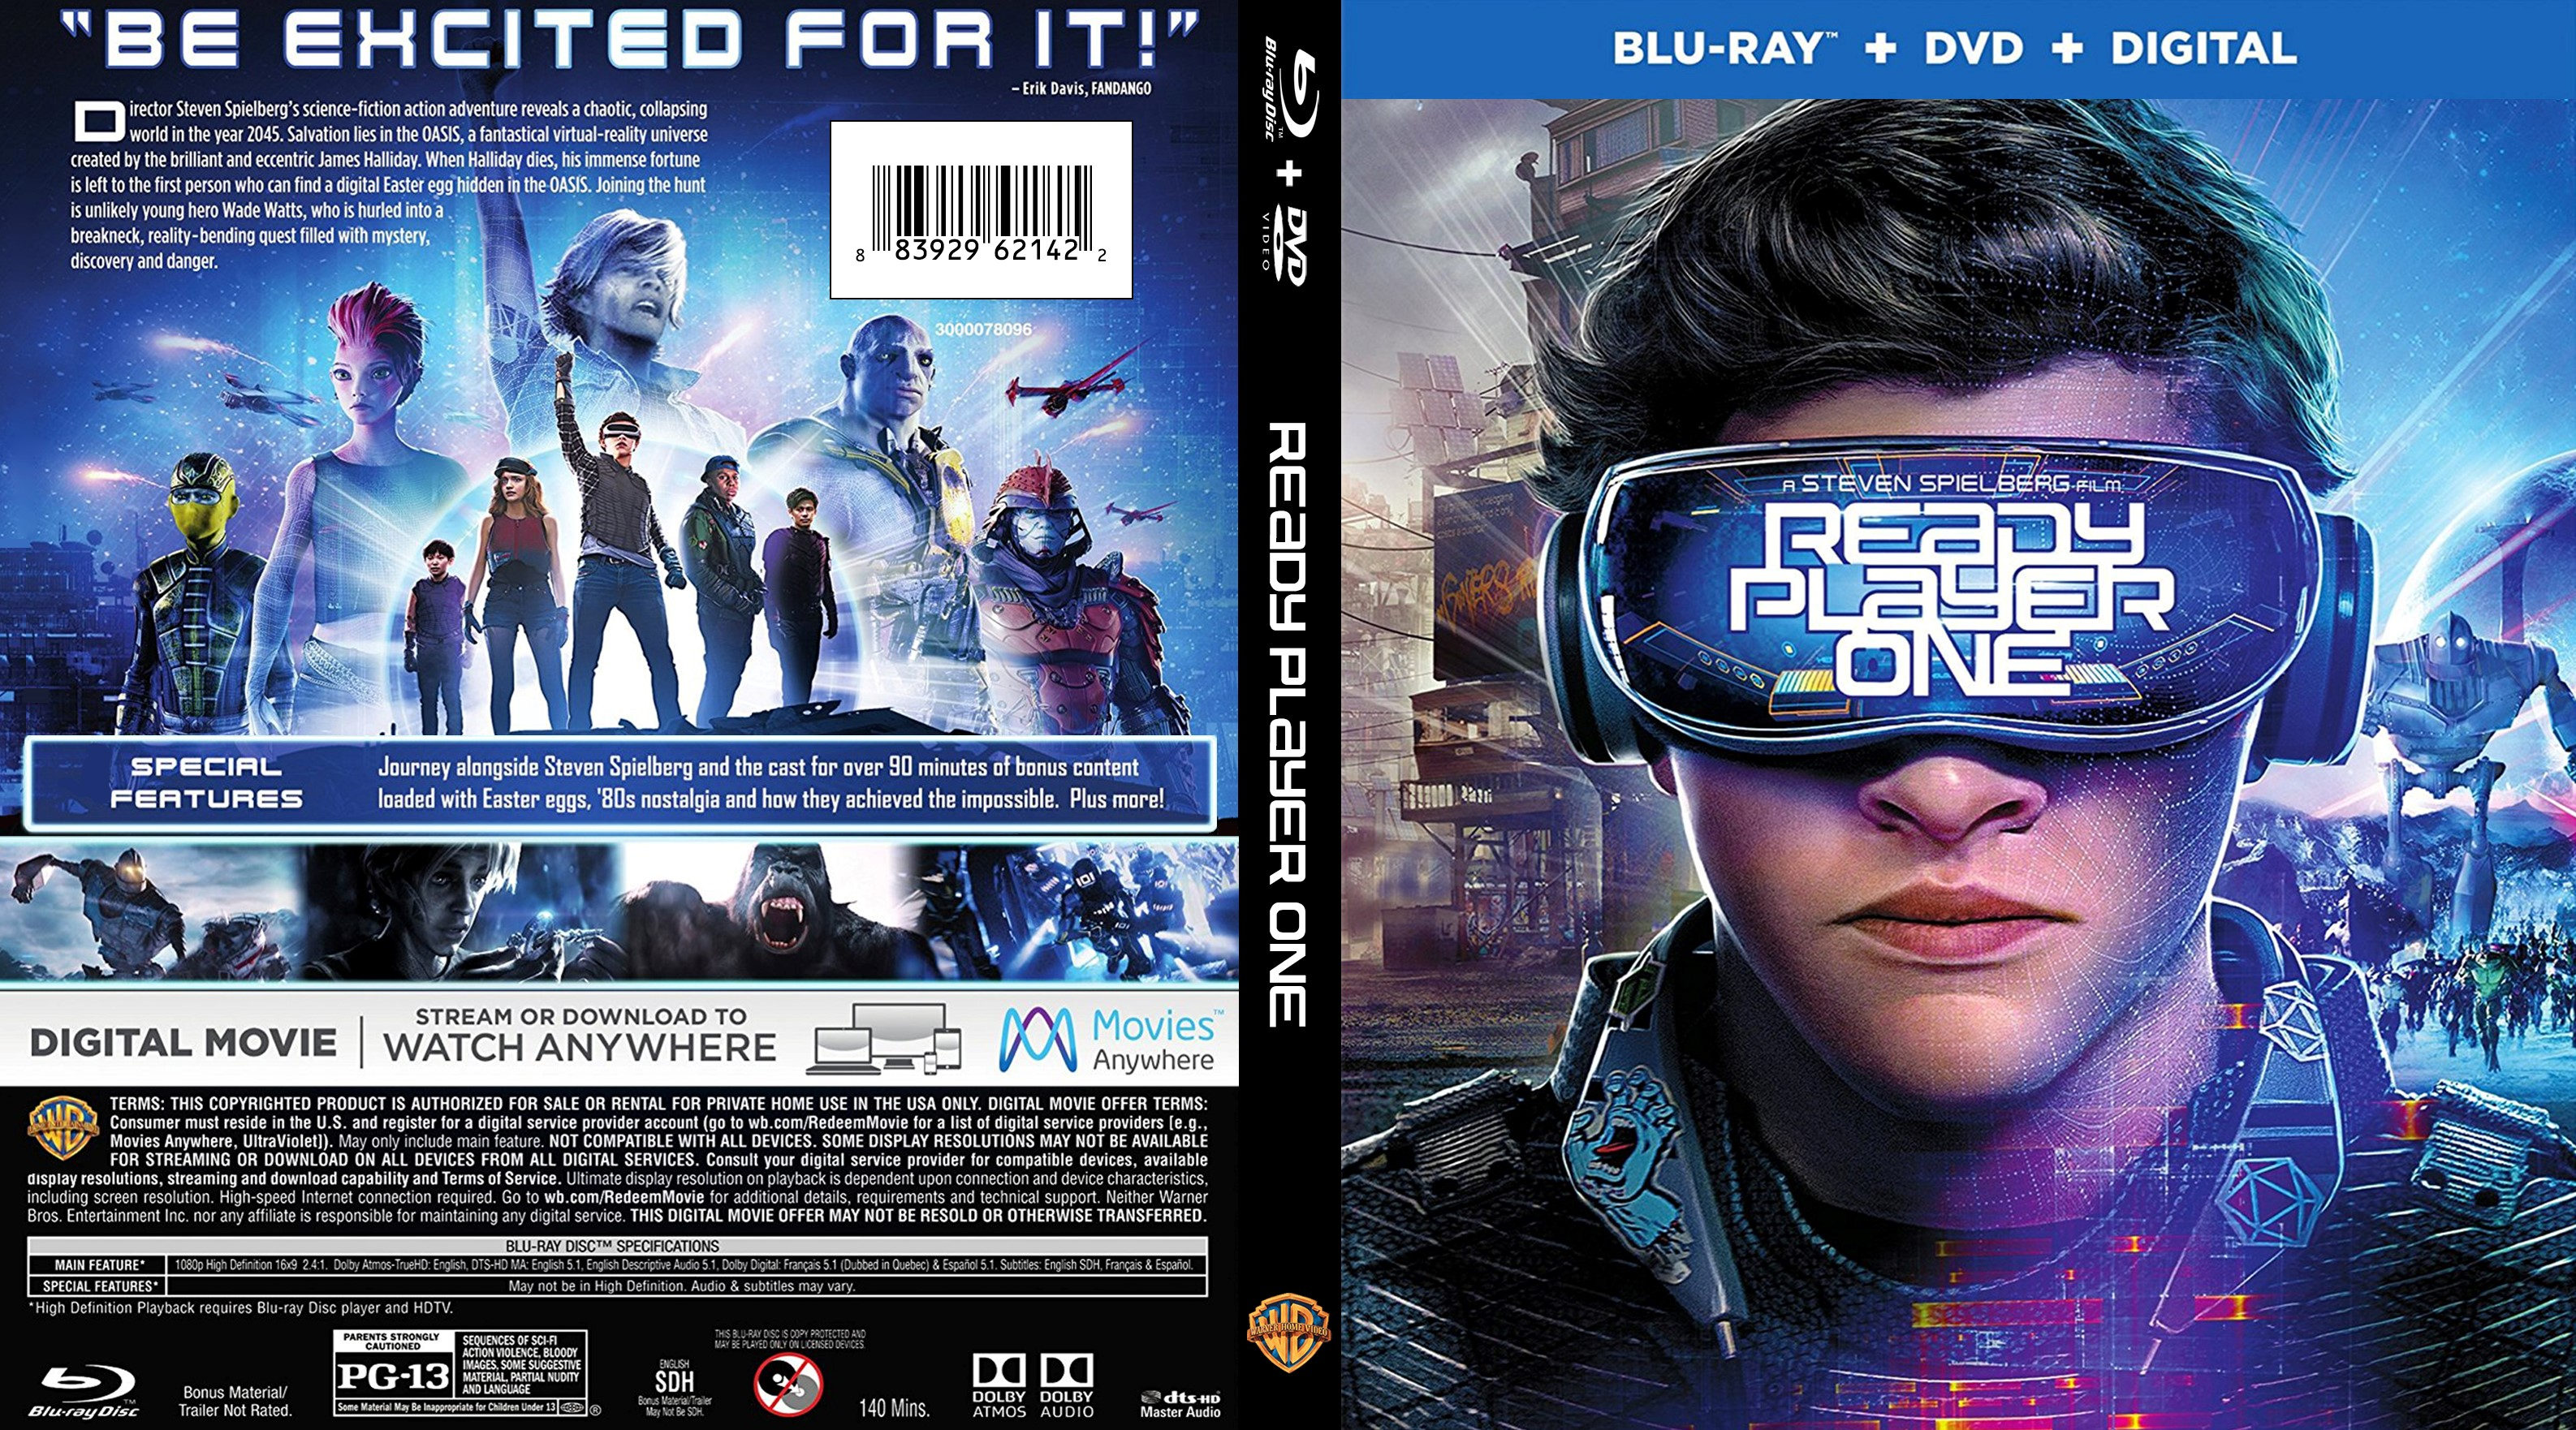 Ready Player One (2018) Hindi 480p 720p BluRay Dual Audio